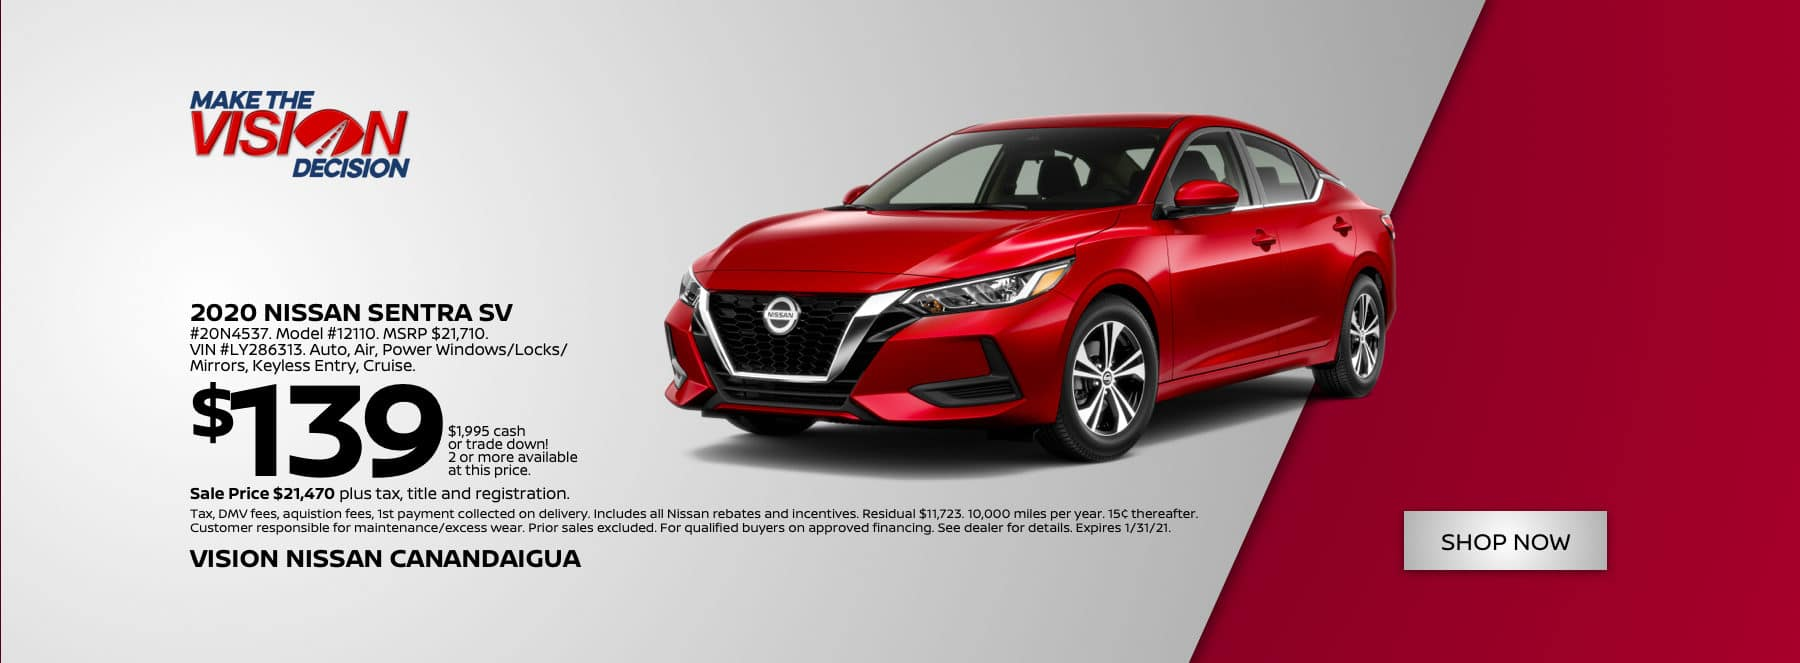 Vision-Nissan-Sliders-0107-Sentra-Can